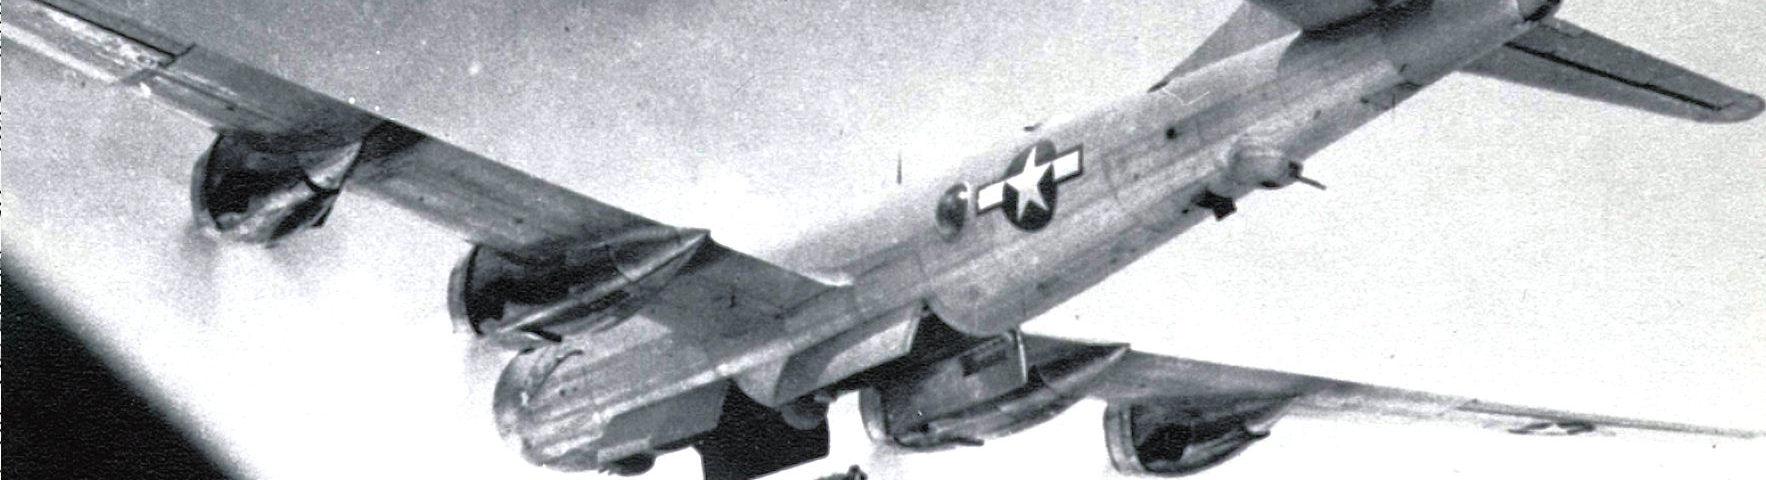 Air Raids Over Japan